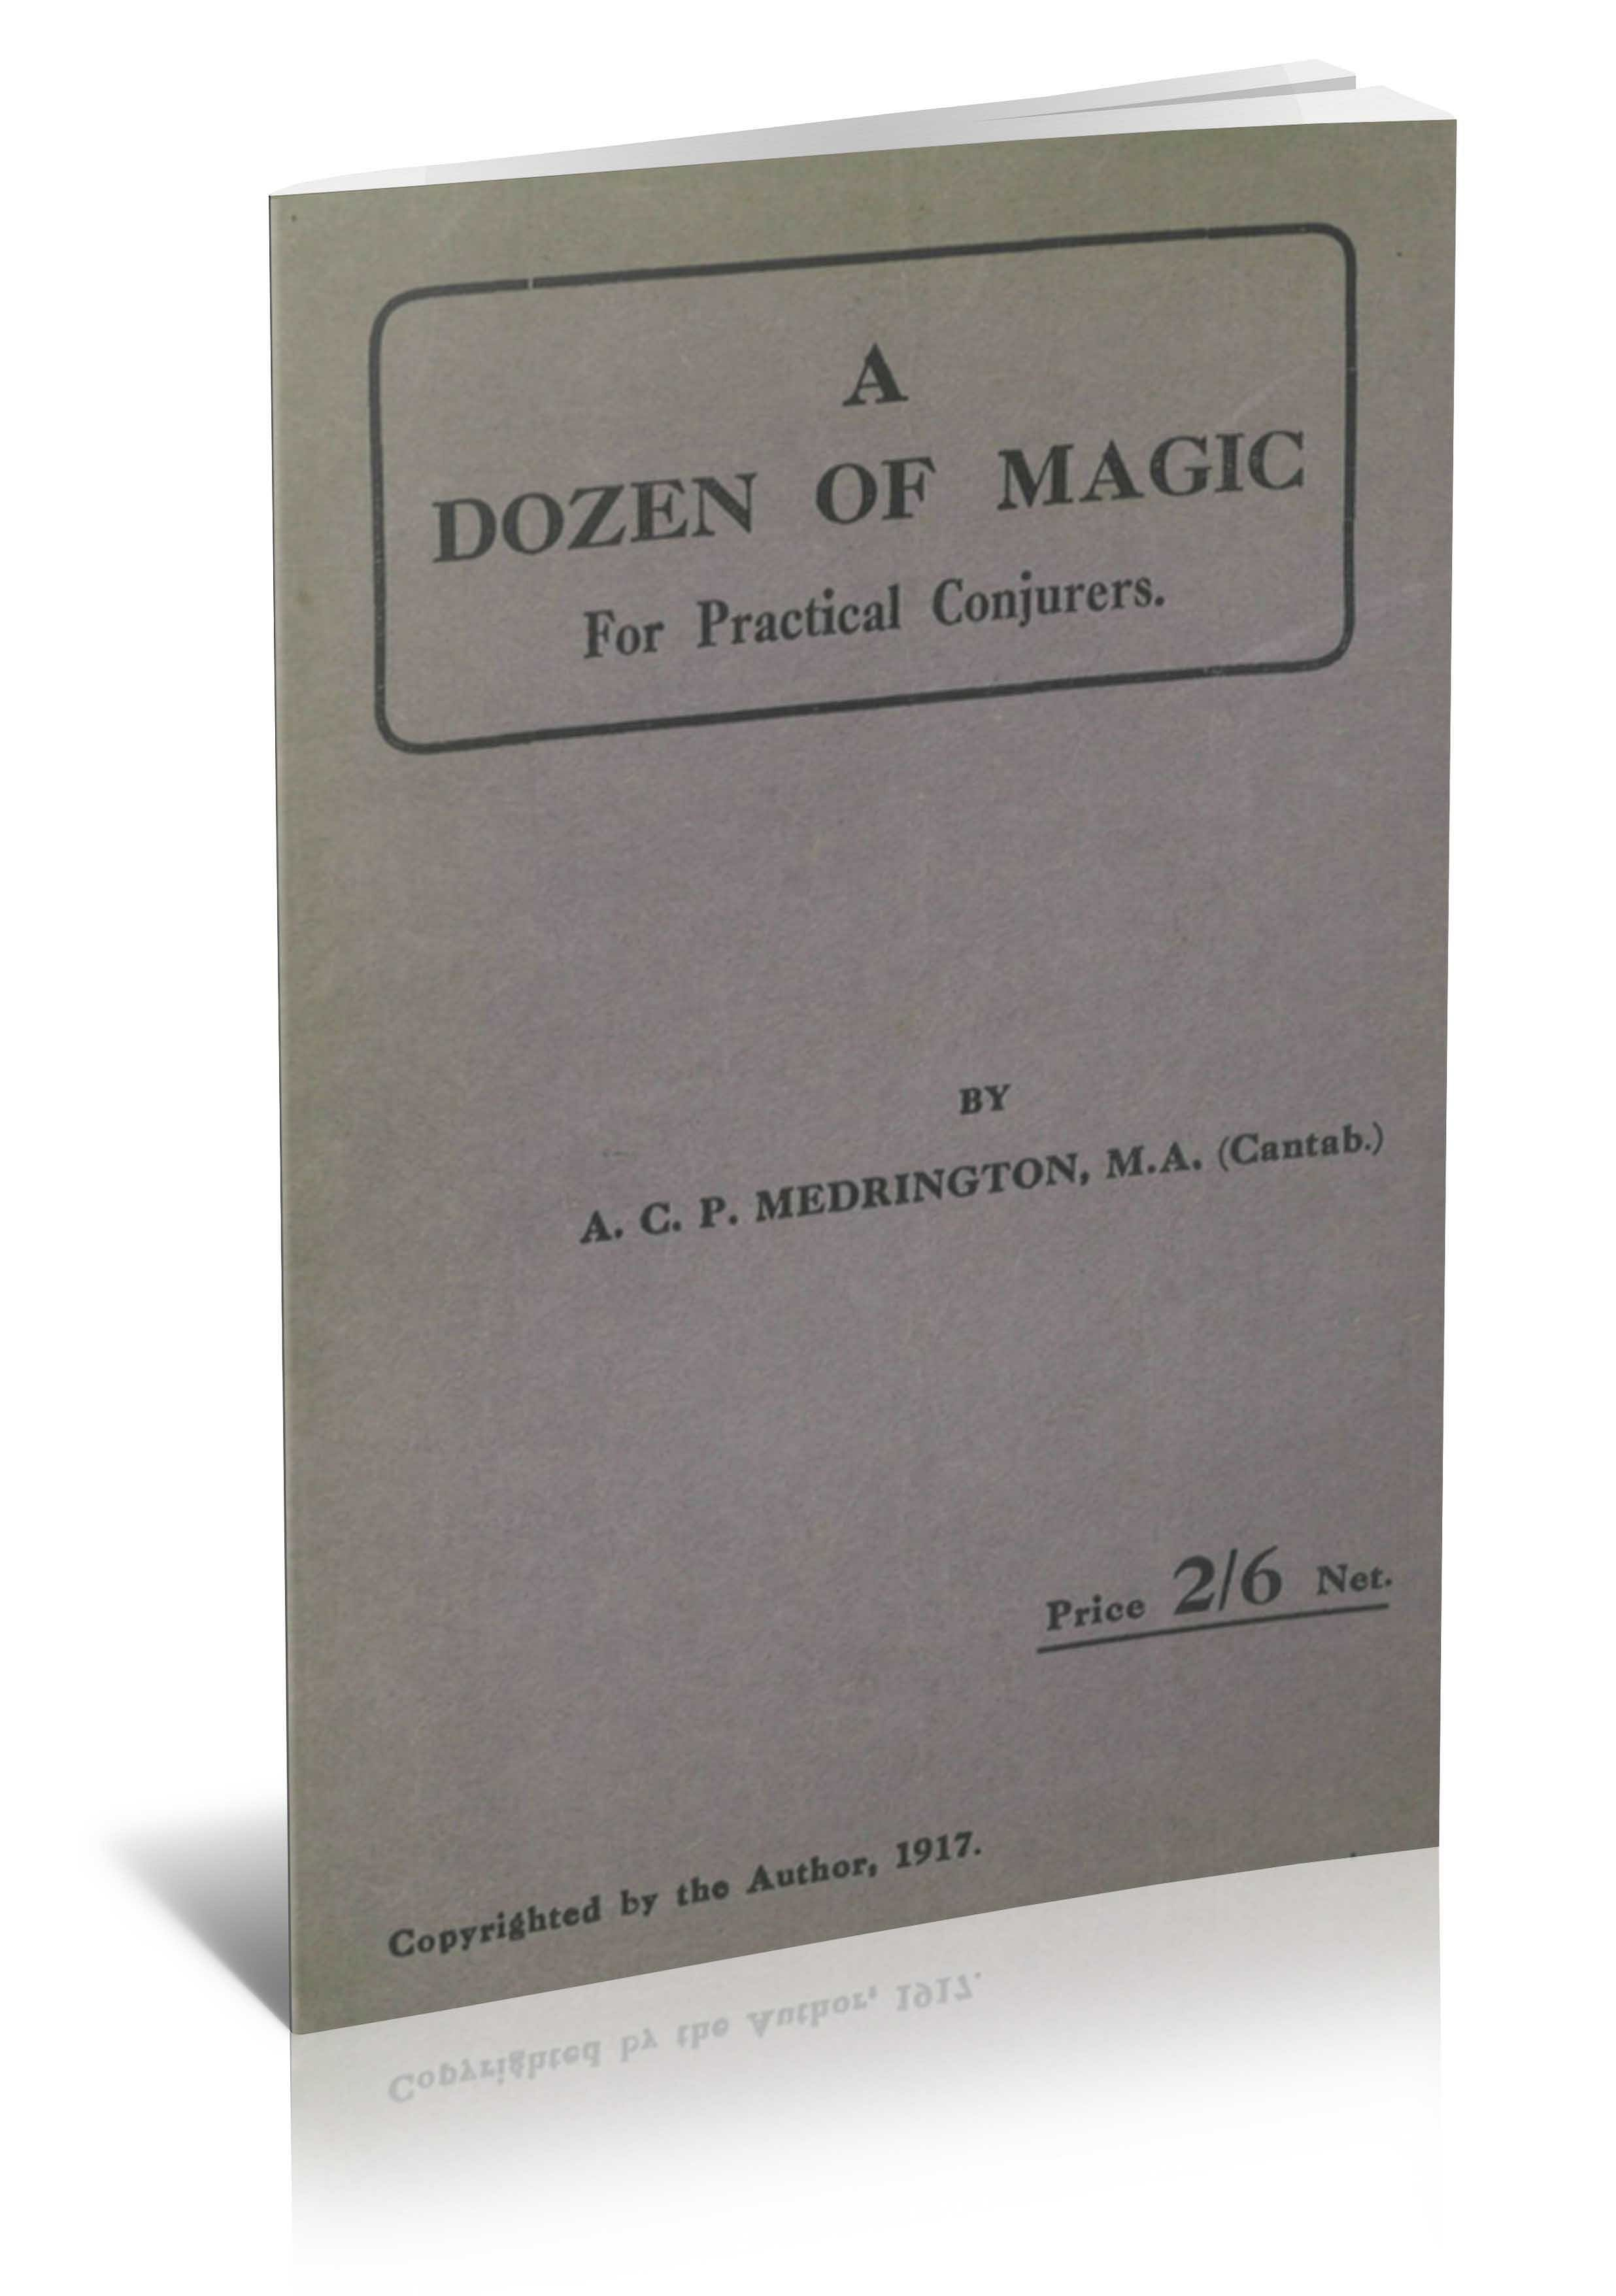 A Dozen of Magic For Practical Conjurers - magic